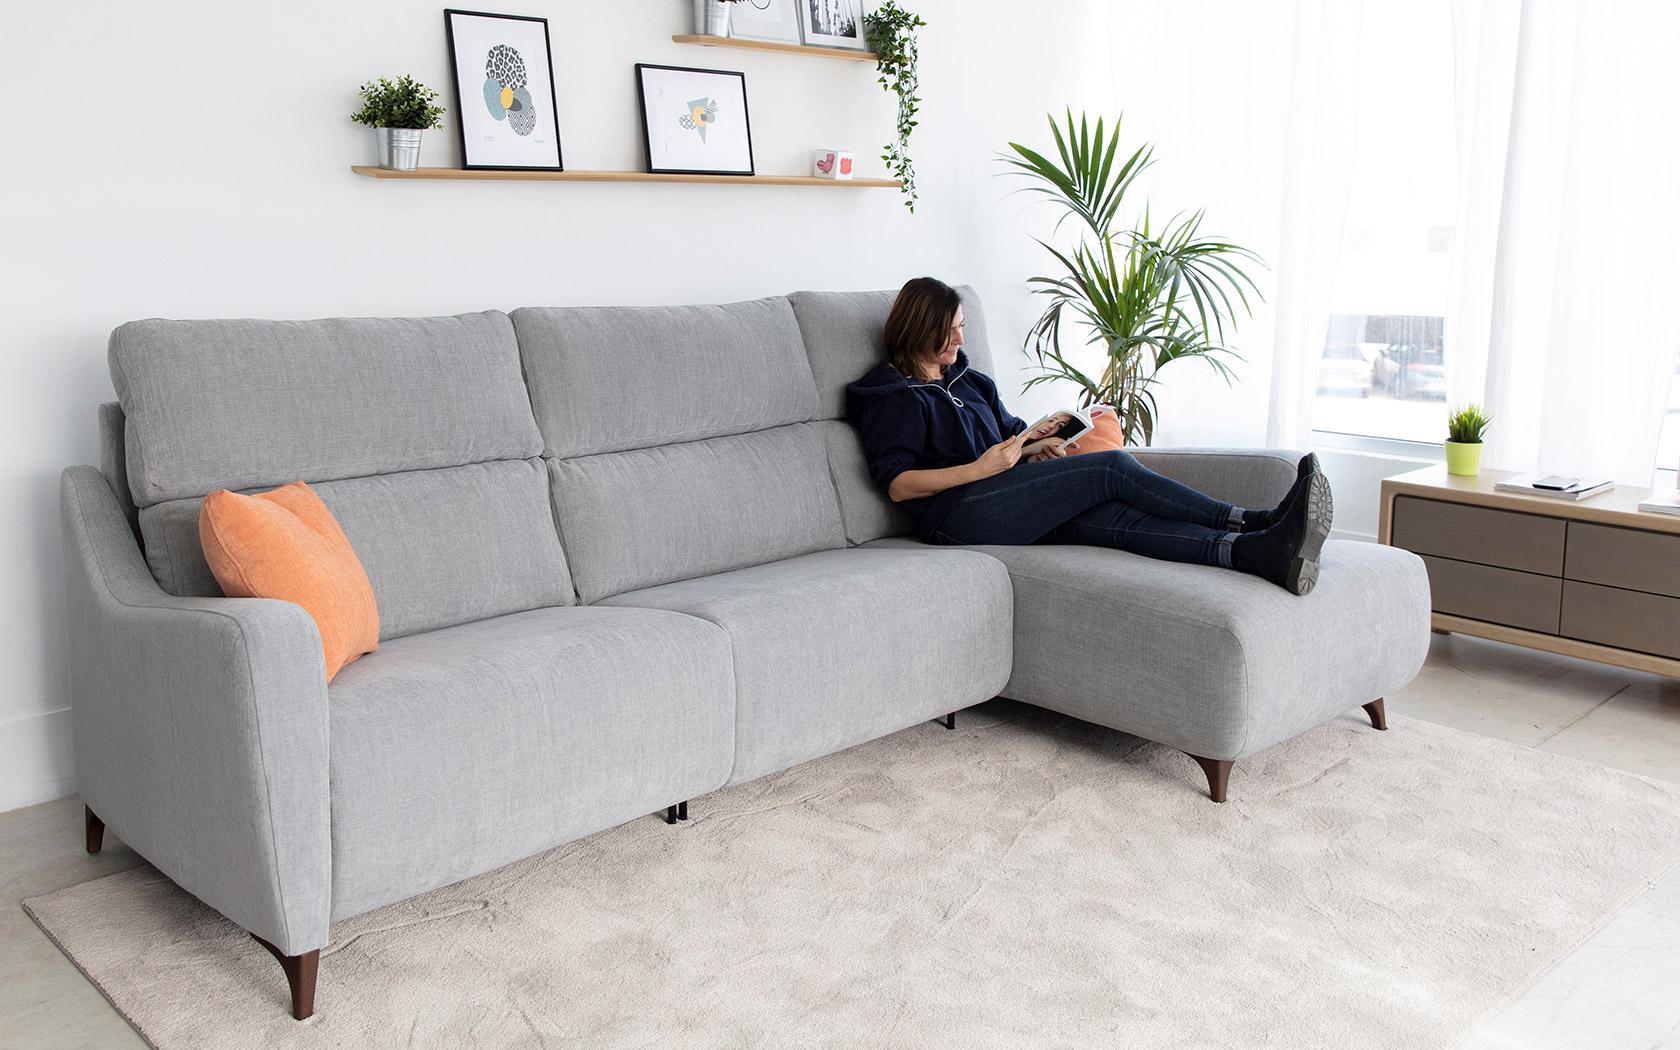 adan sillon relax 2021 11